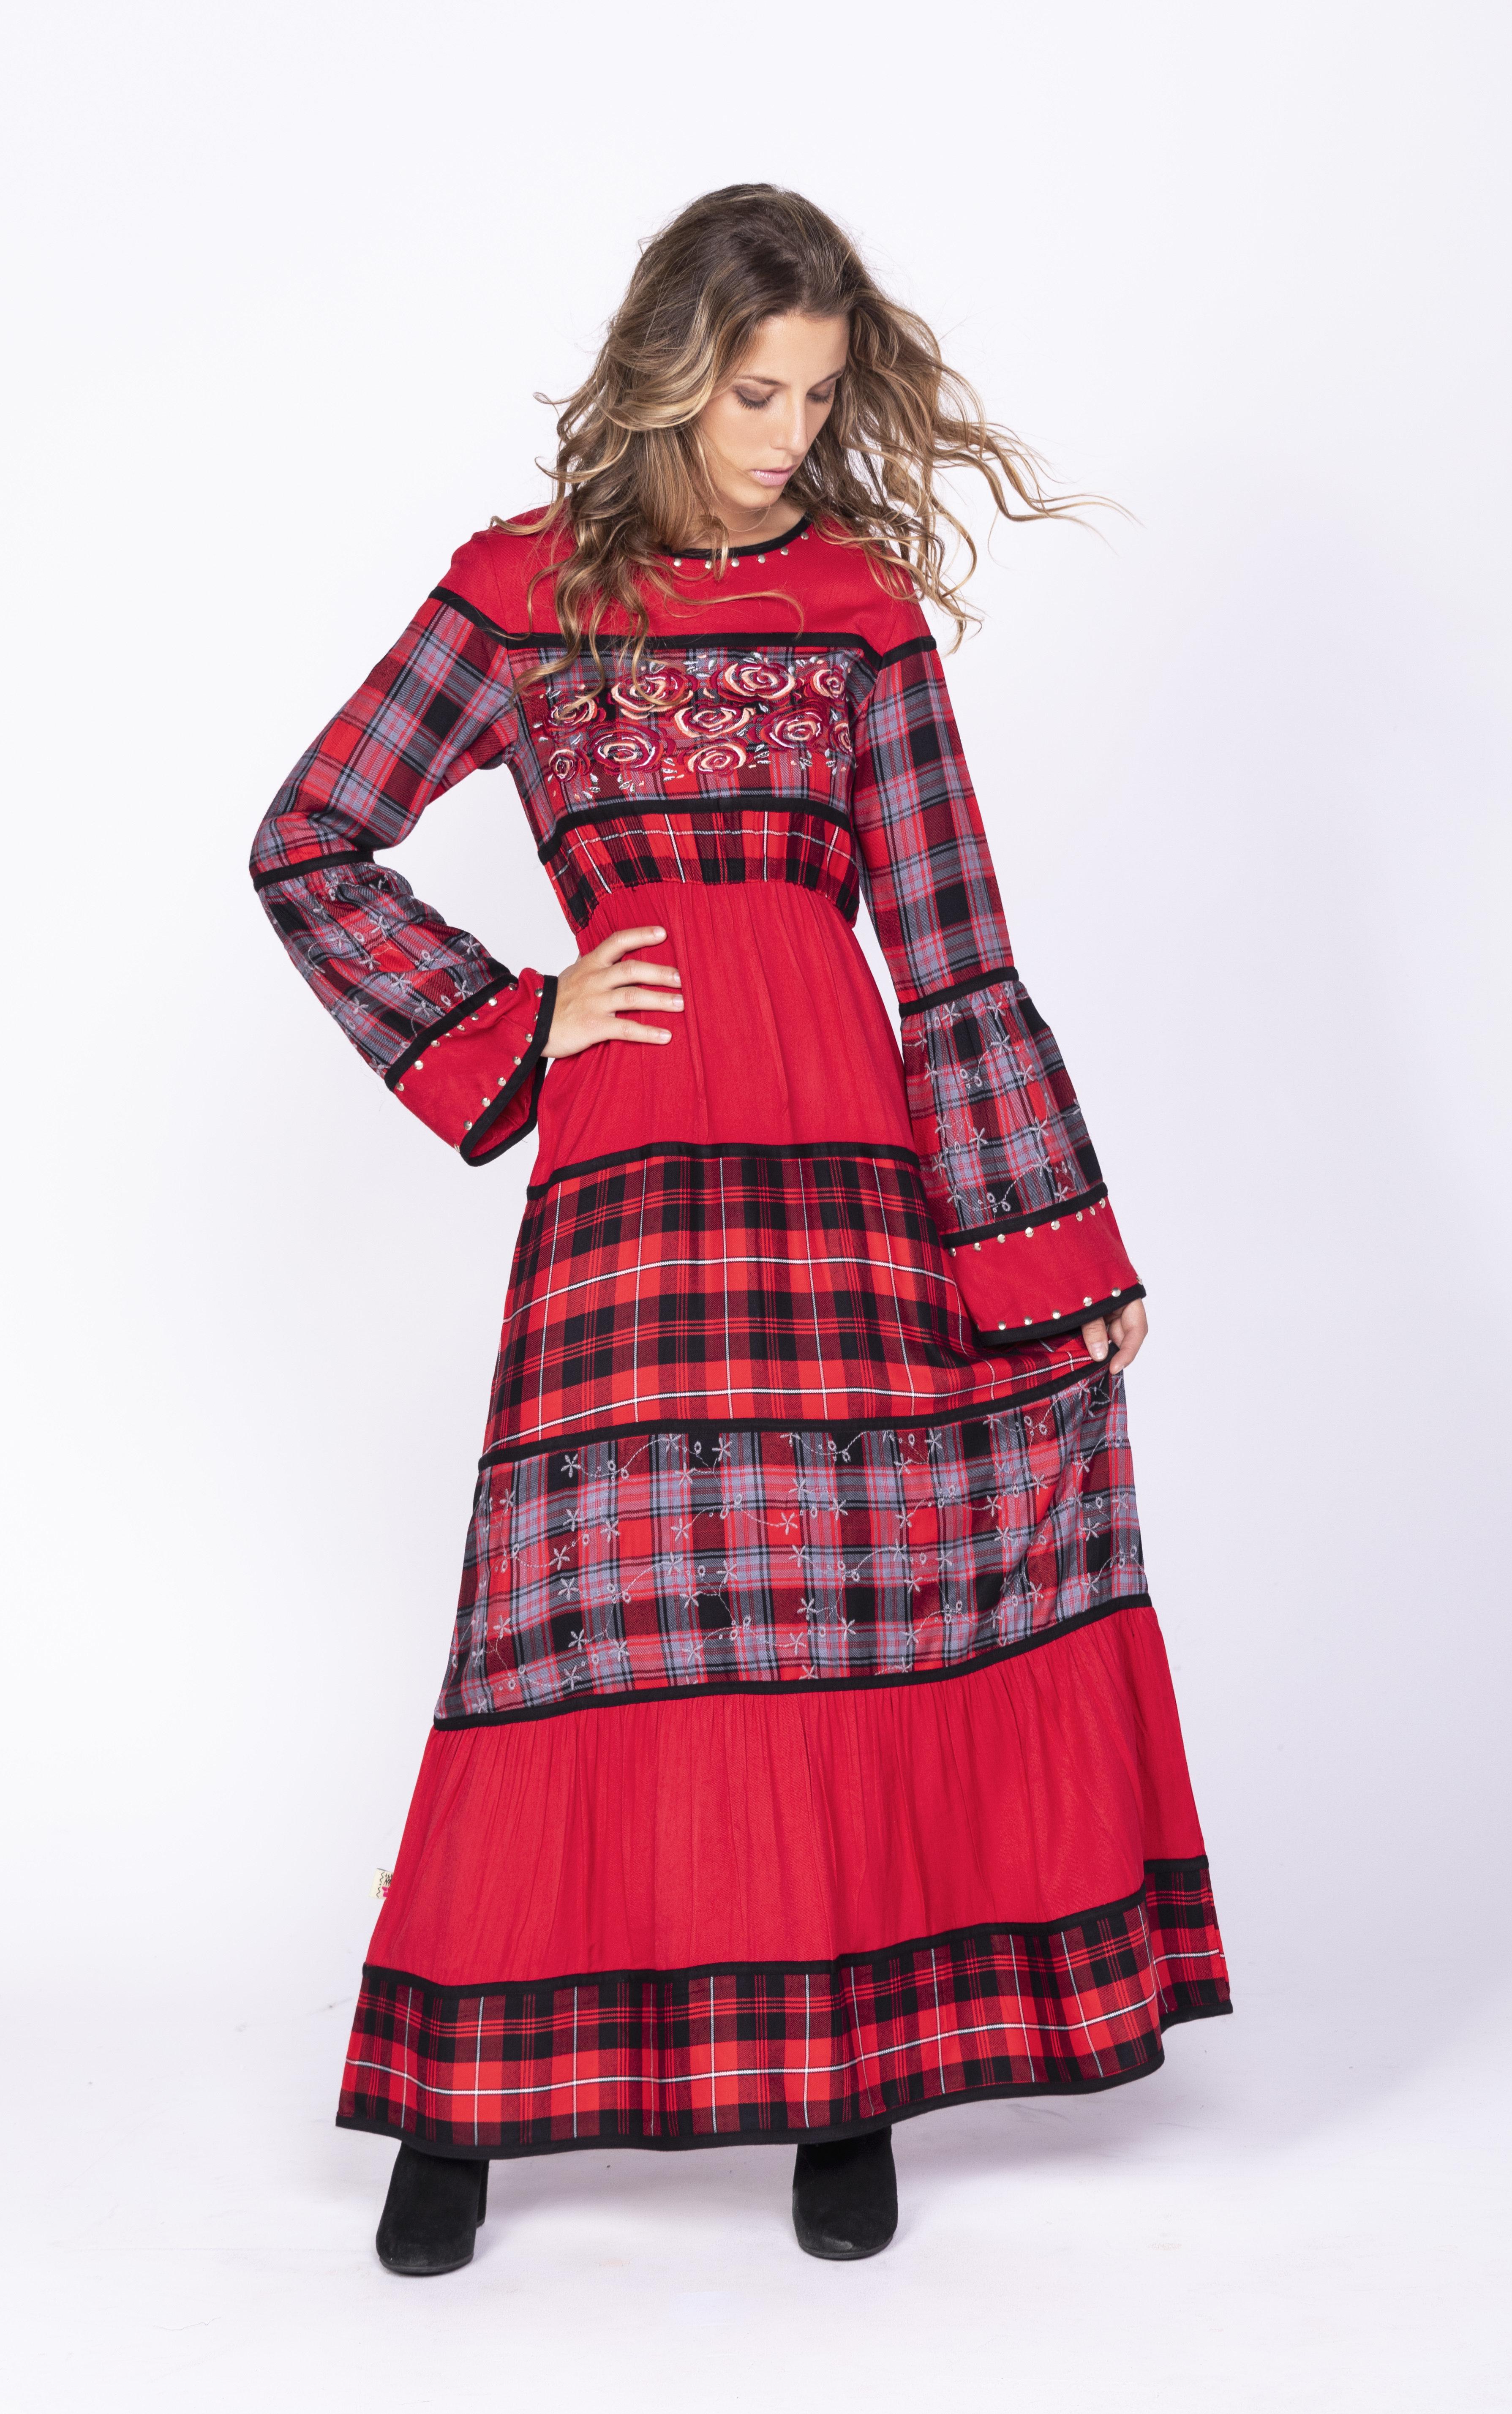 Savage Culture: Rose Red Plaid High Waist Dress SAVAGE_35060_N